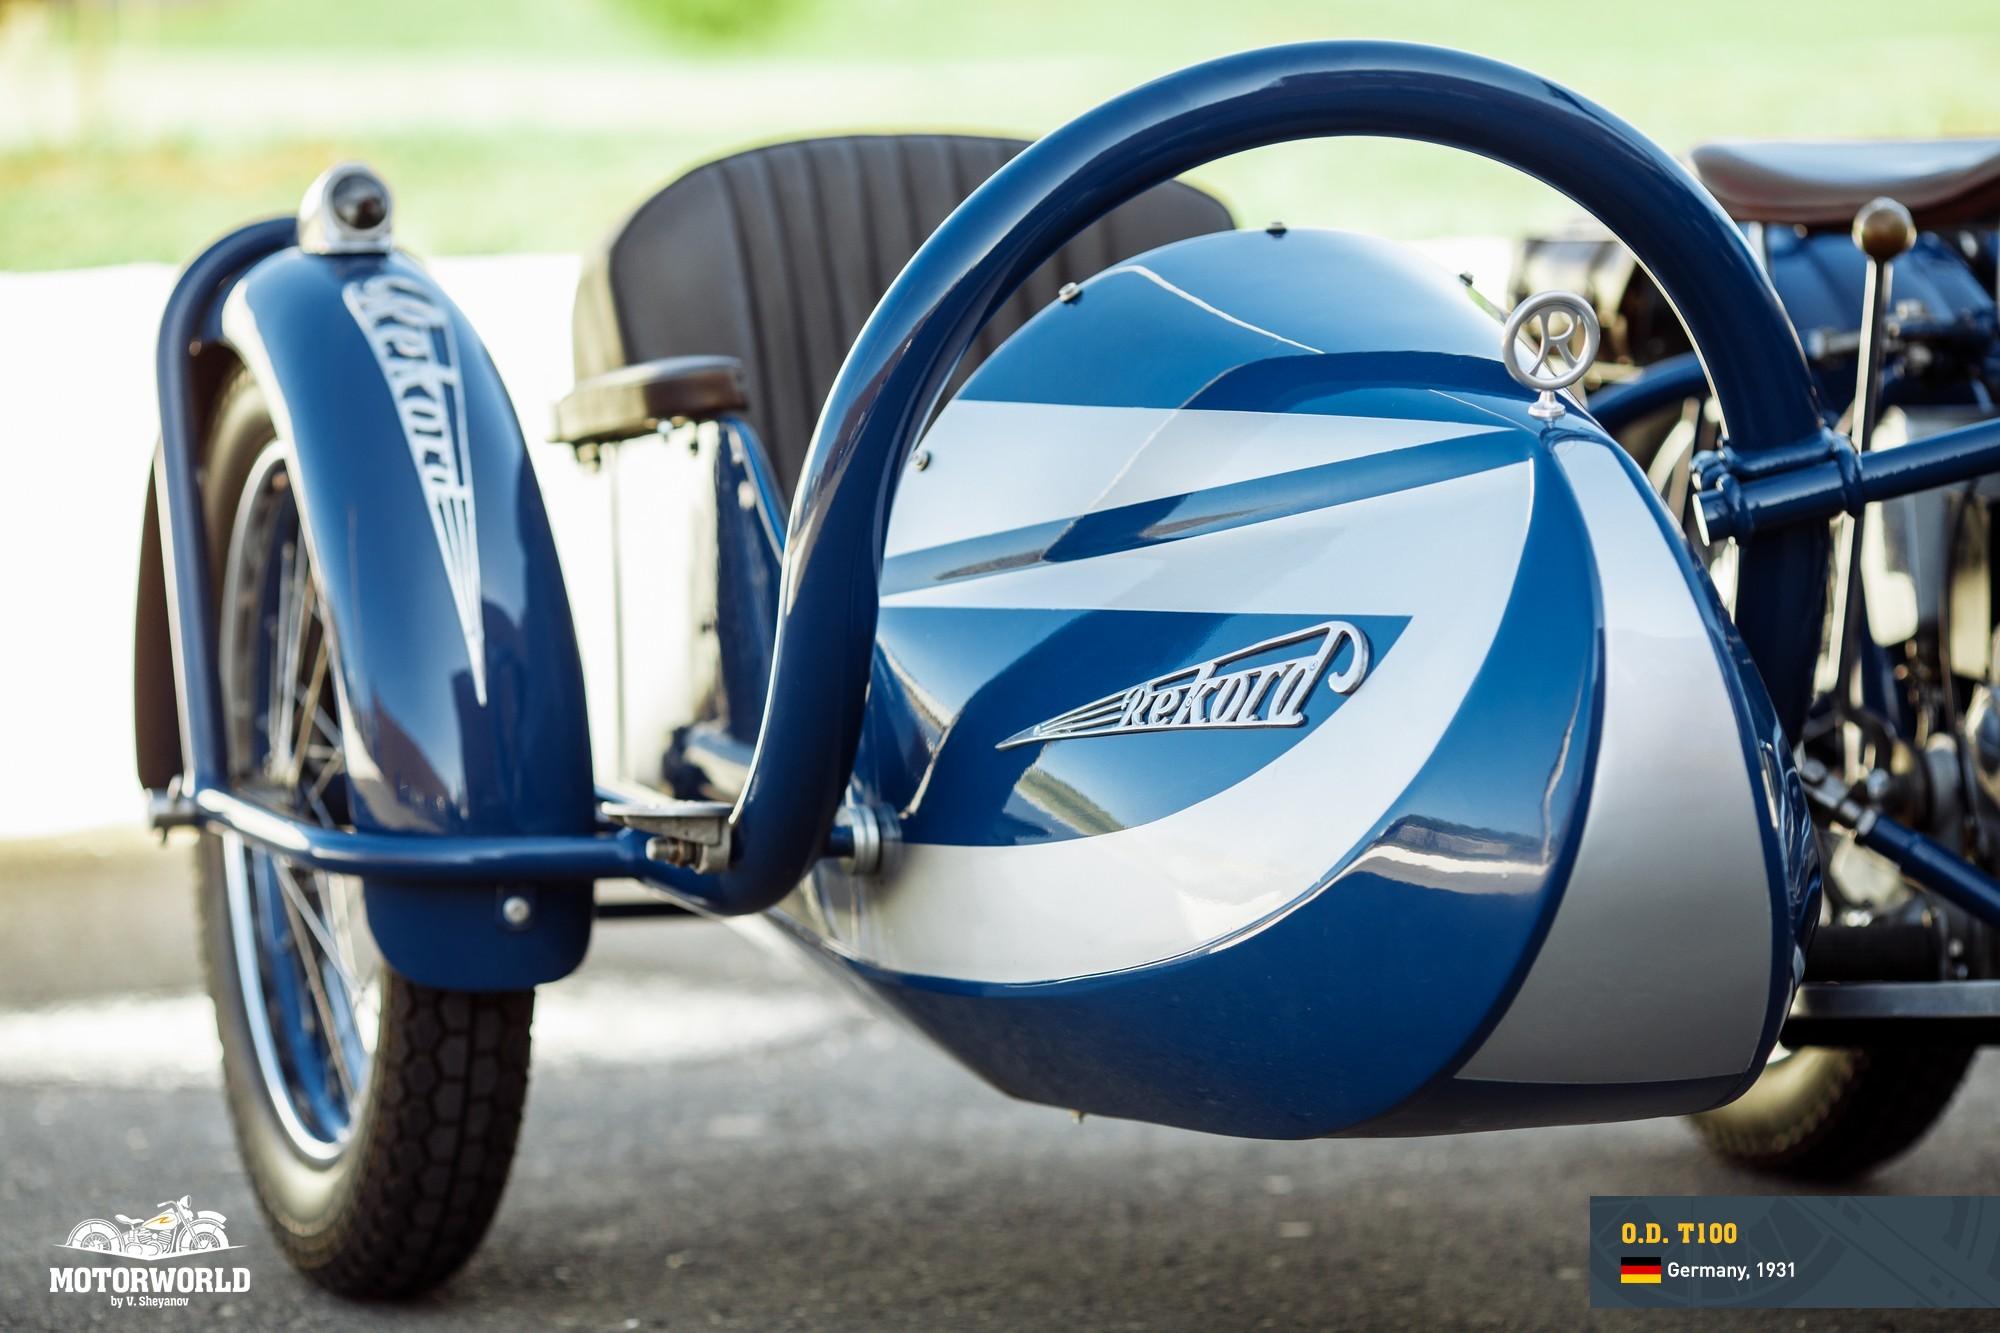 Rekord sidecar